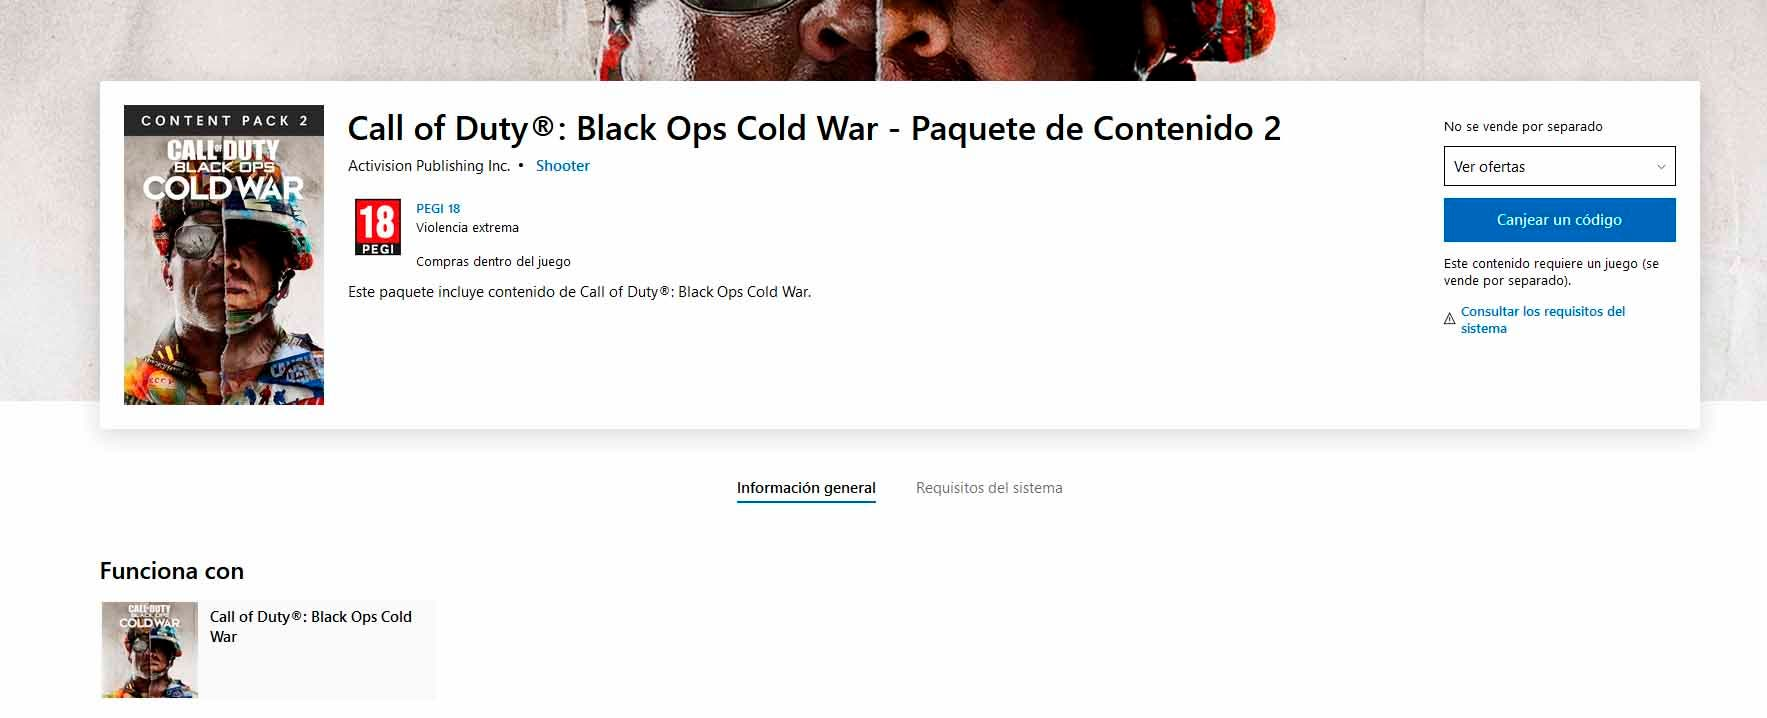 Se descubren varios packs de contenidos de Call of Duty: Black Ops Cold War en la Xbox Store 3